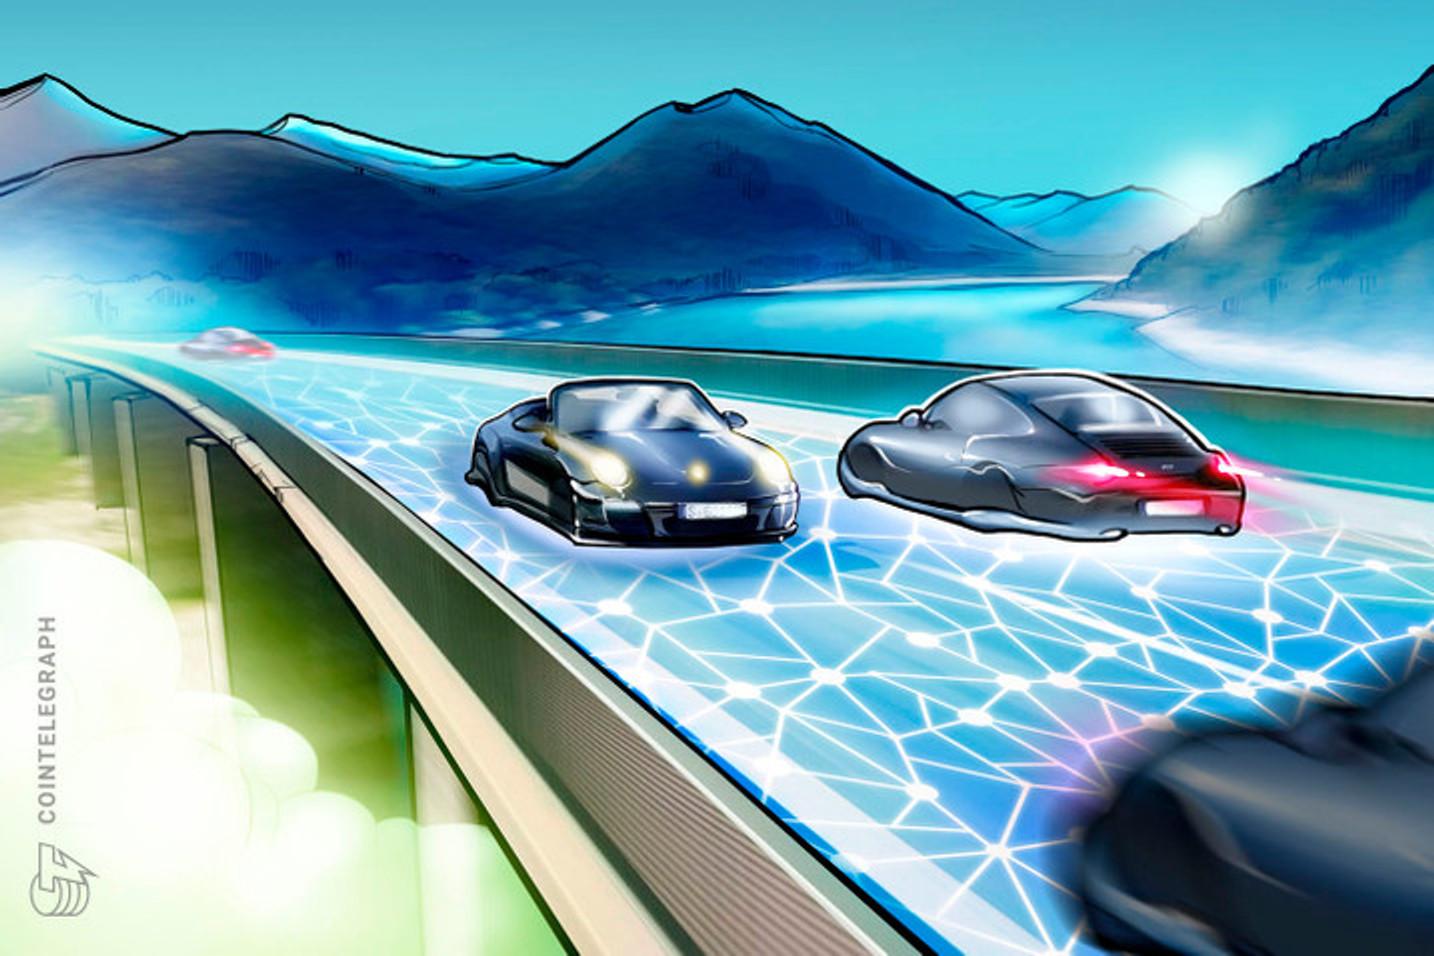 Tesla Model 3: Wiener Startup Eloop bietet Blockchain-Investments in E-Carsharing-Flotte